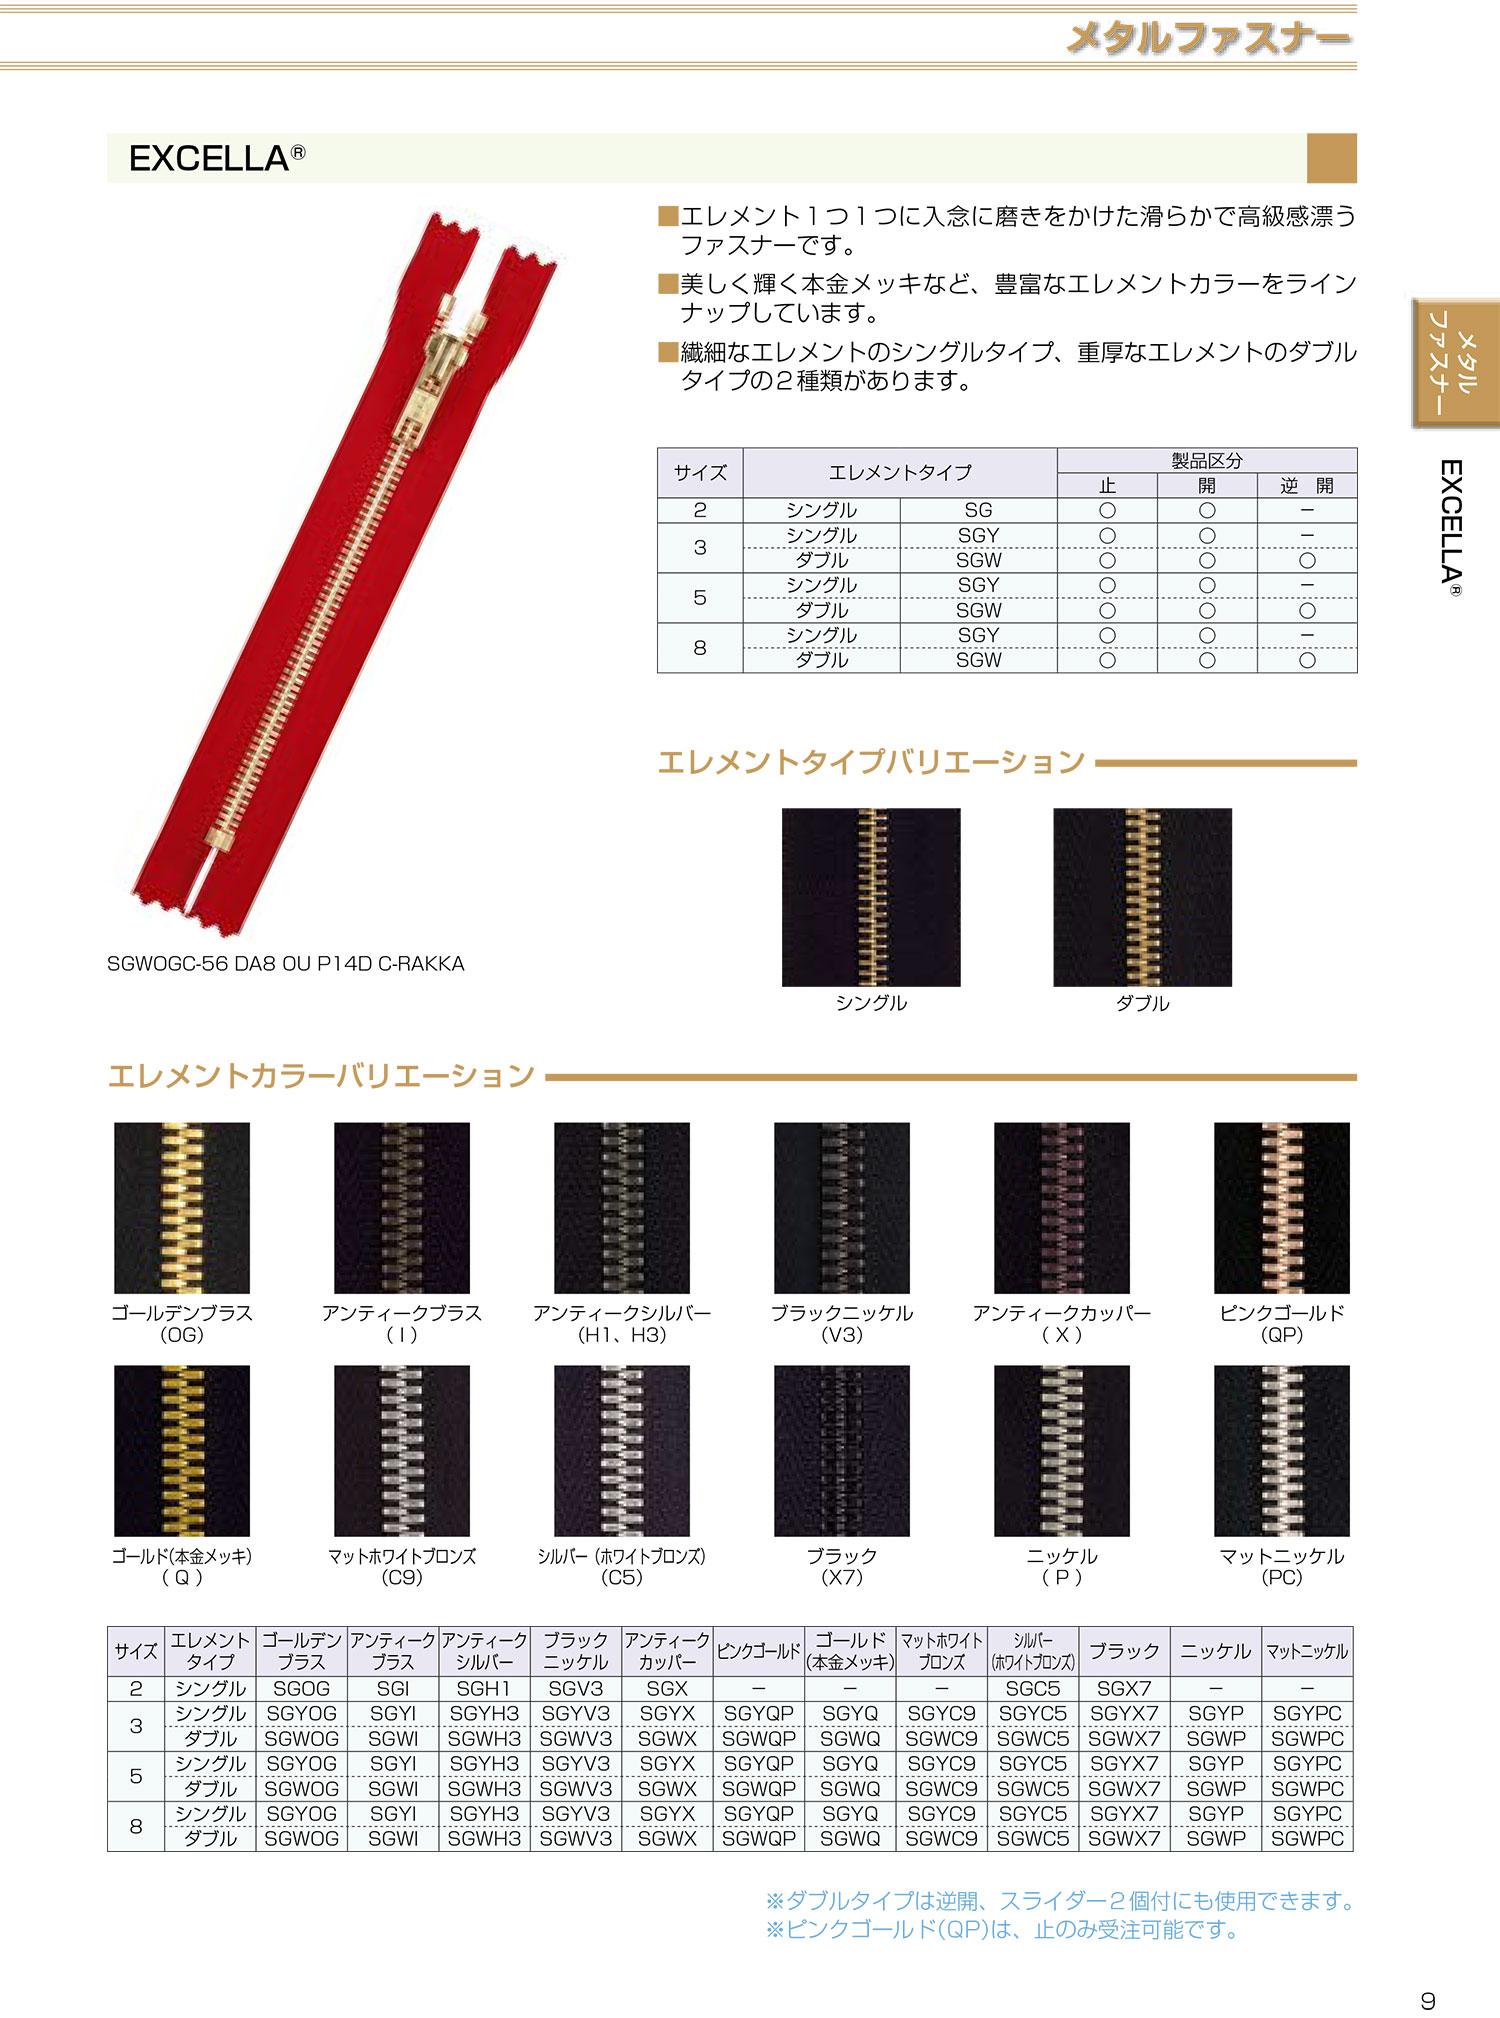 8SGWXOR エクセラ 8サイズ アンティークカッパー オープン ダブル[ファスナー] YKK/オークラ商事 - ApparelX アパレル資材卸通販